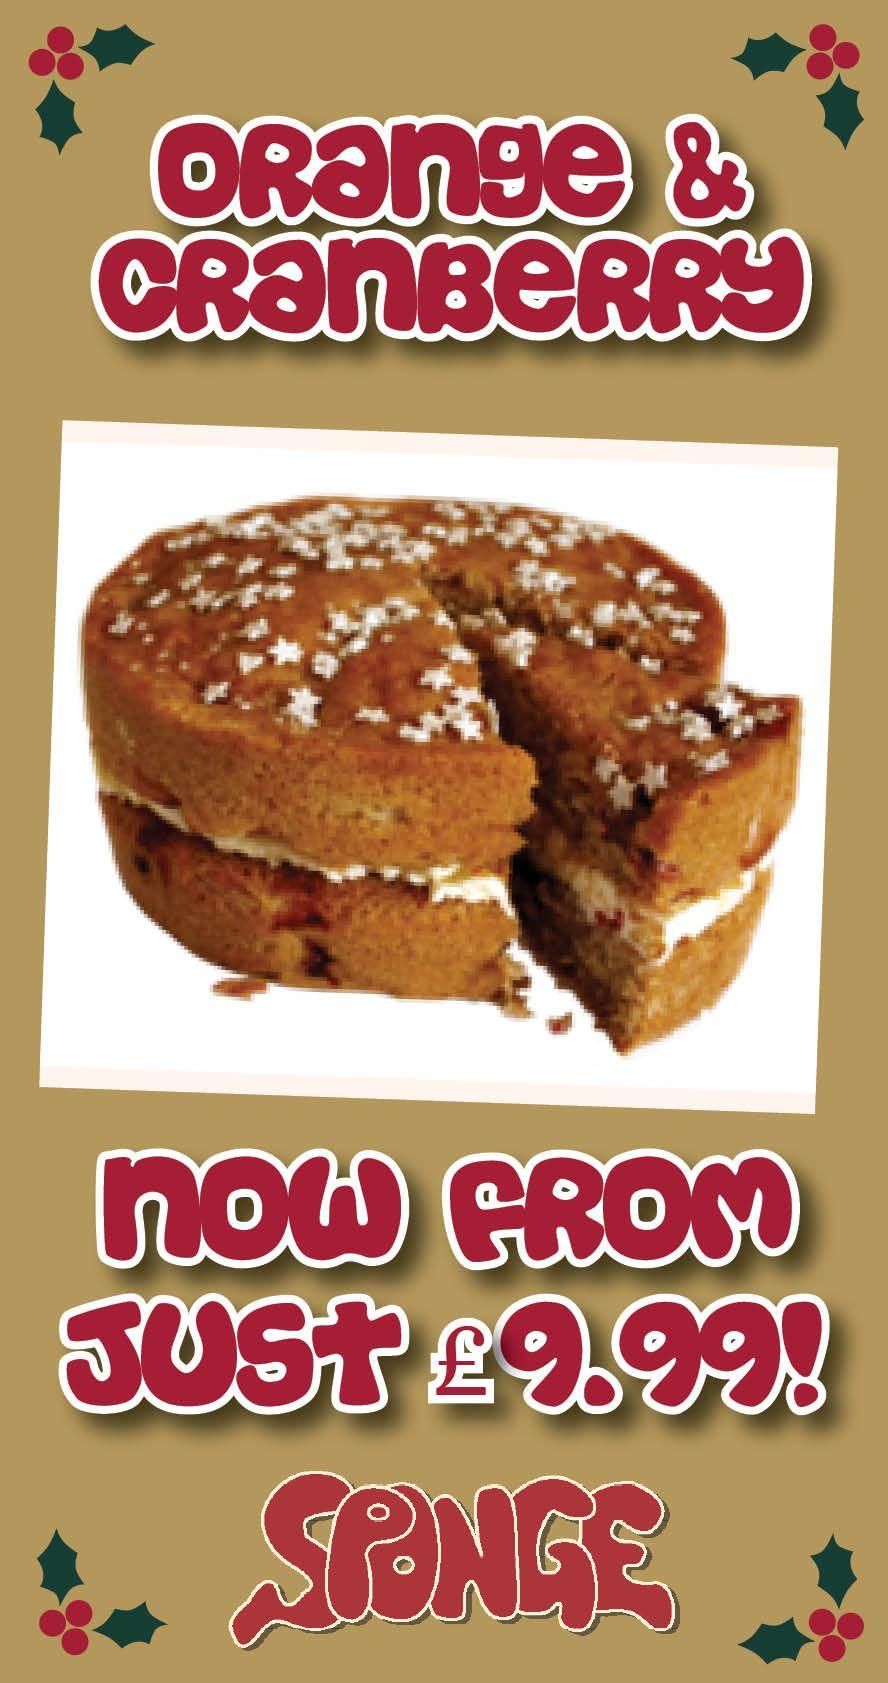 Tremendous Sponge Sponge Cakes Cake Delivery Bakers Birthday Gift Personalised Birthday Cards Paralily Jamesorg